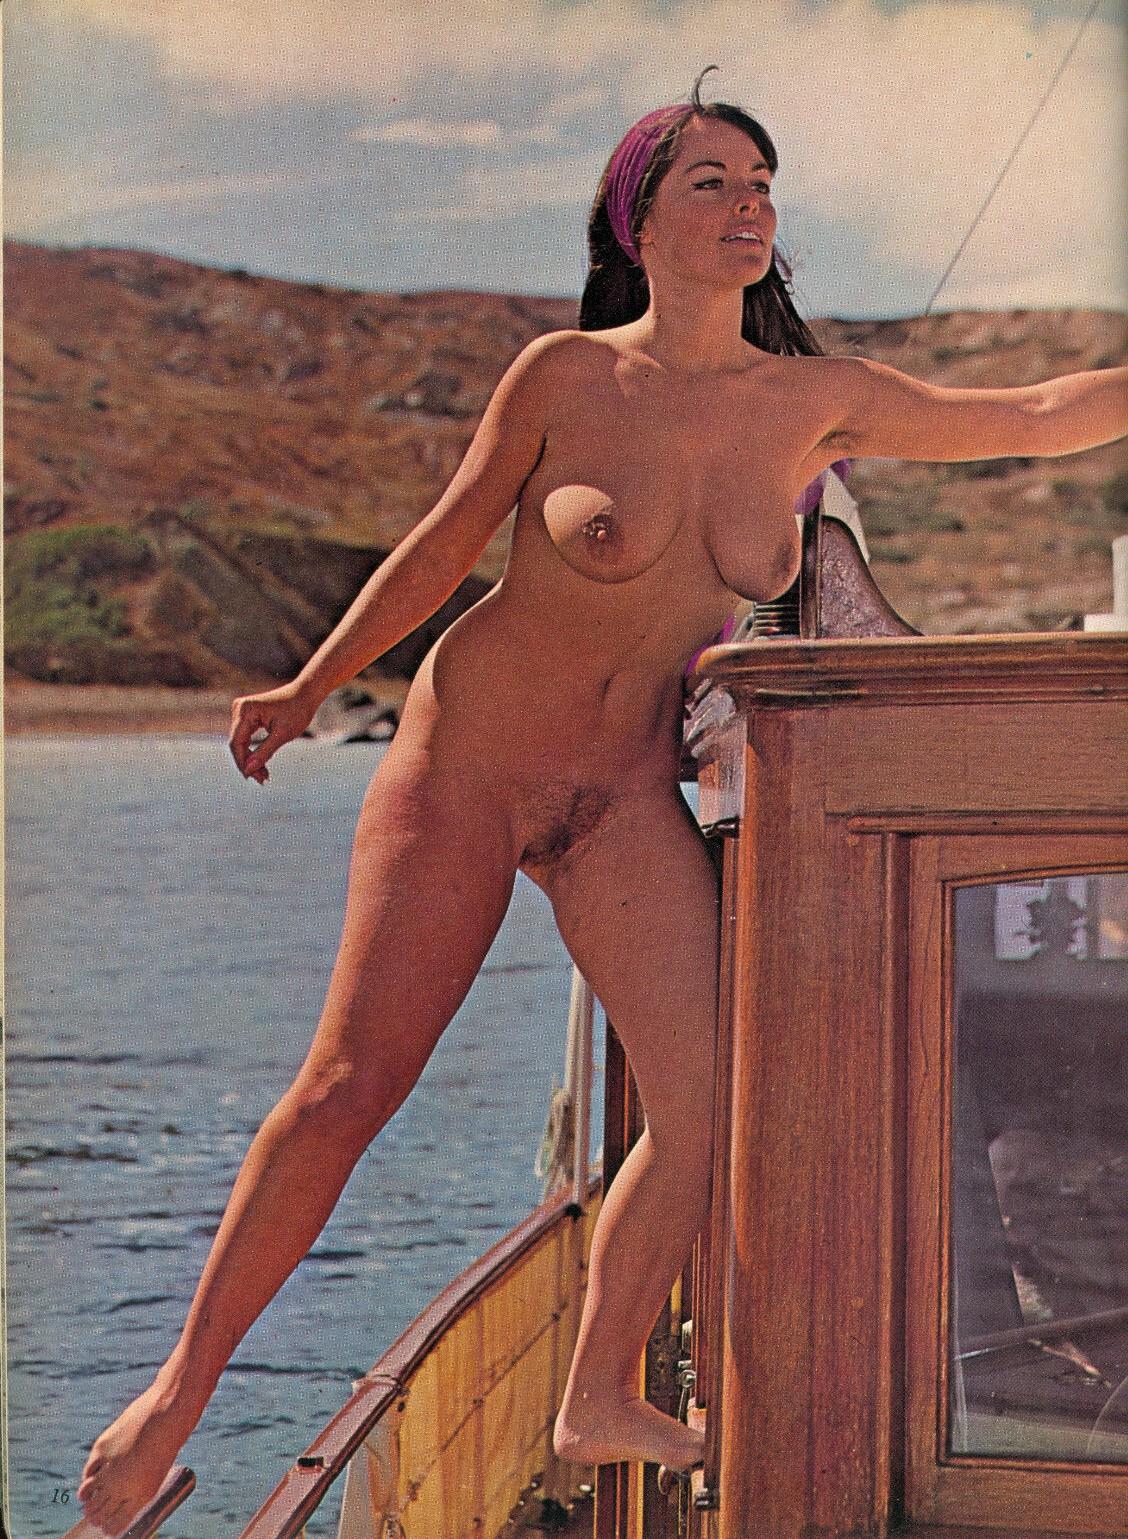 nudist Diane webber